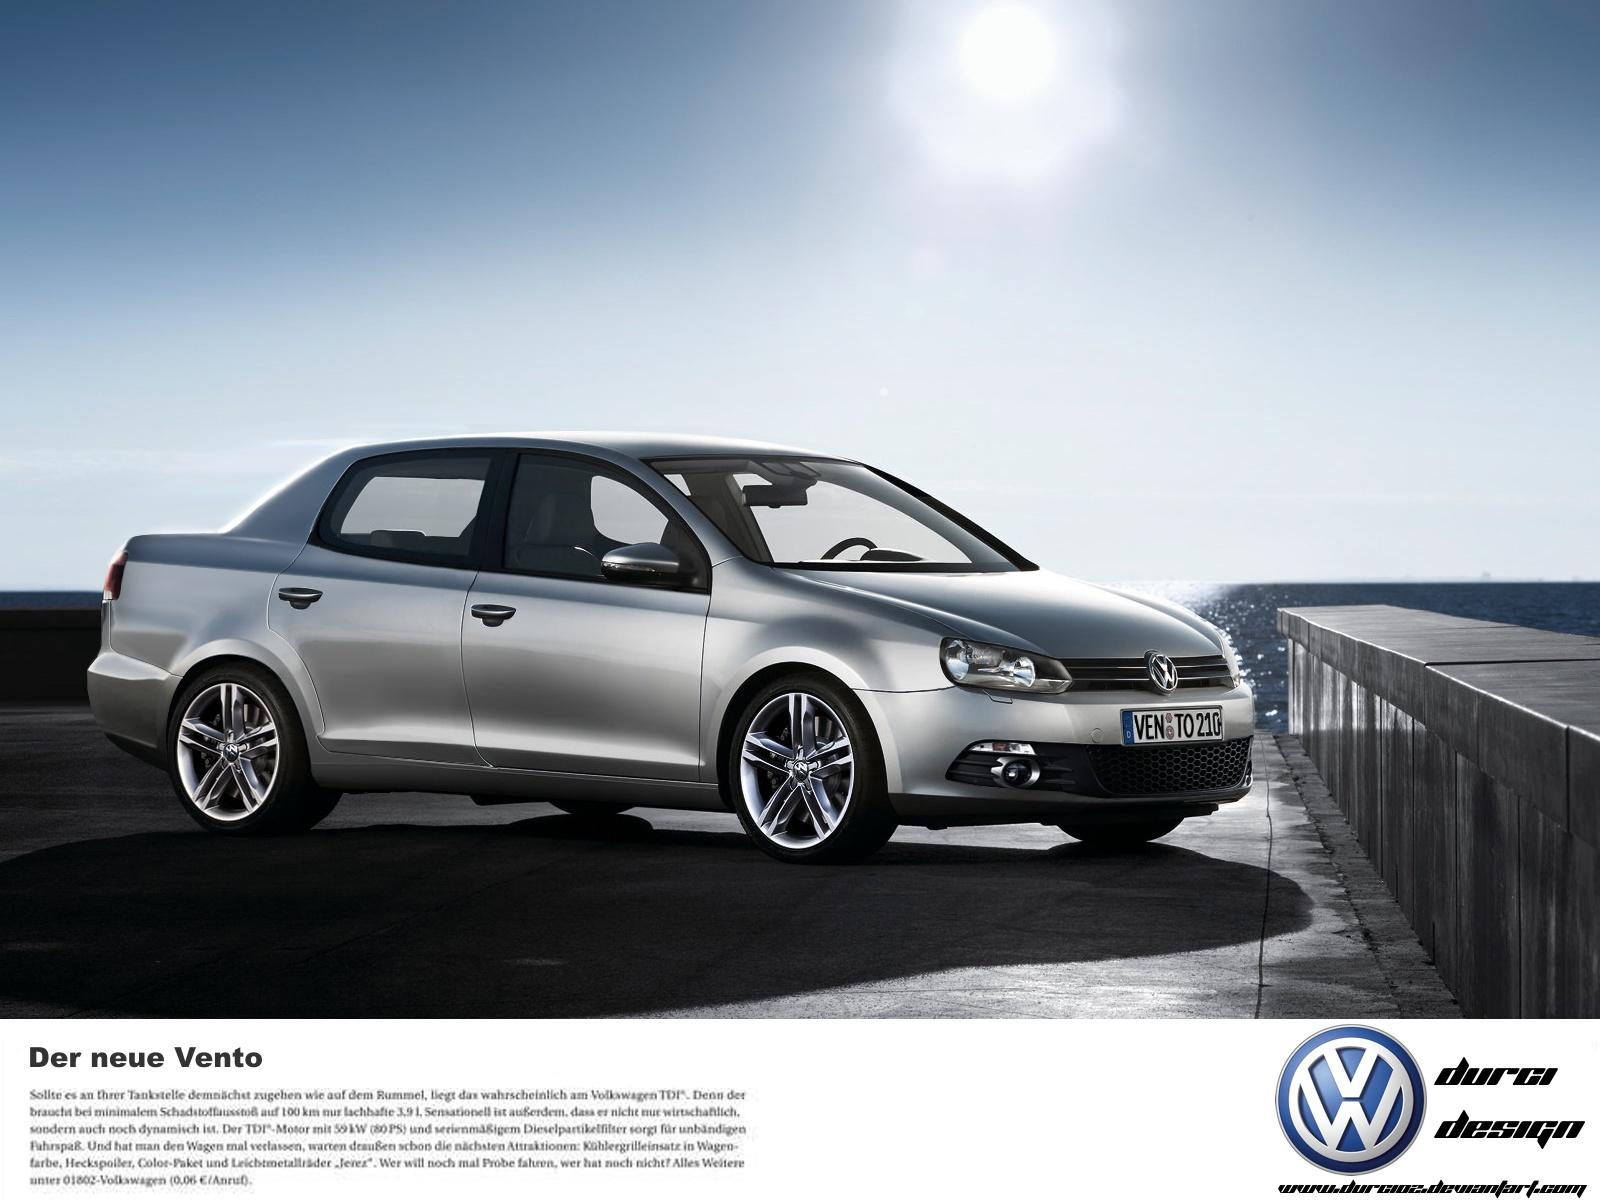 Volkswagen Vento 41 Background Wallpaper Car Hd Wallpaper